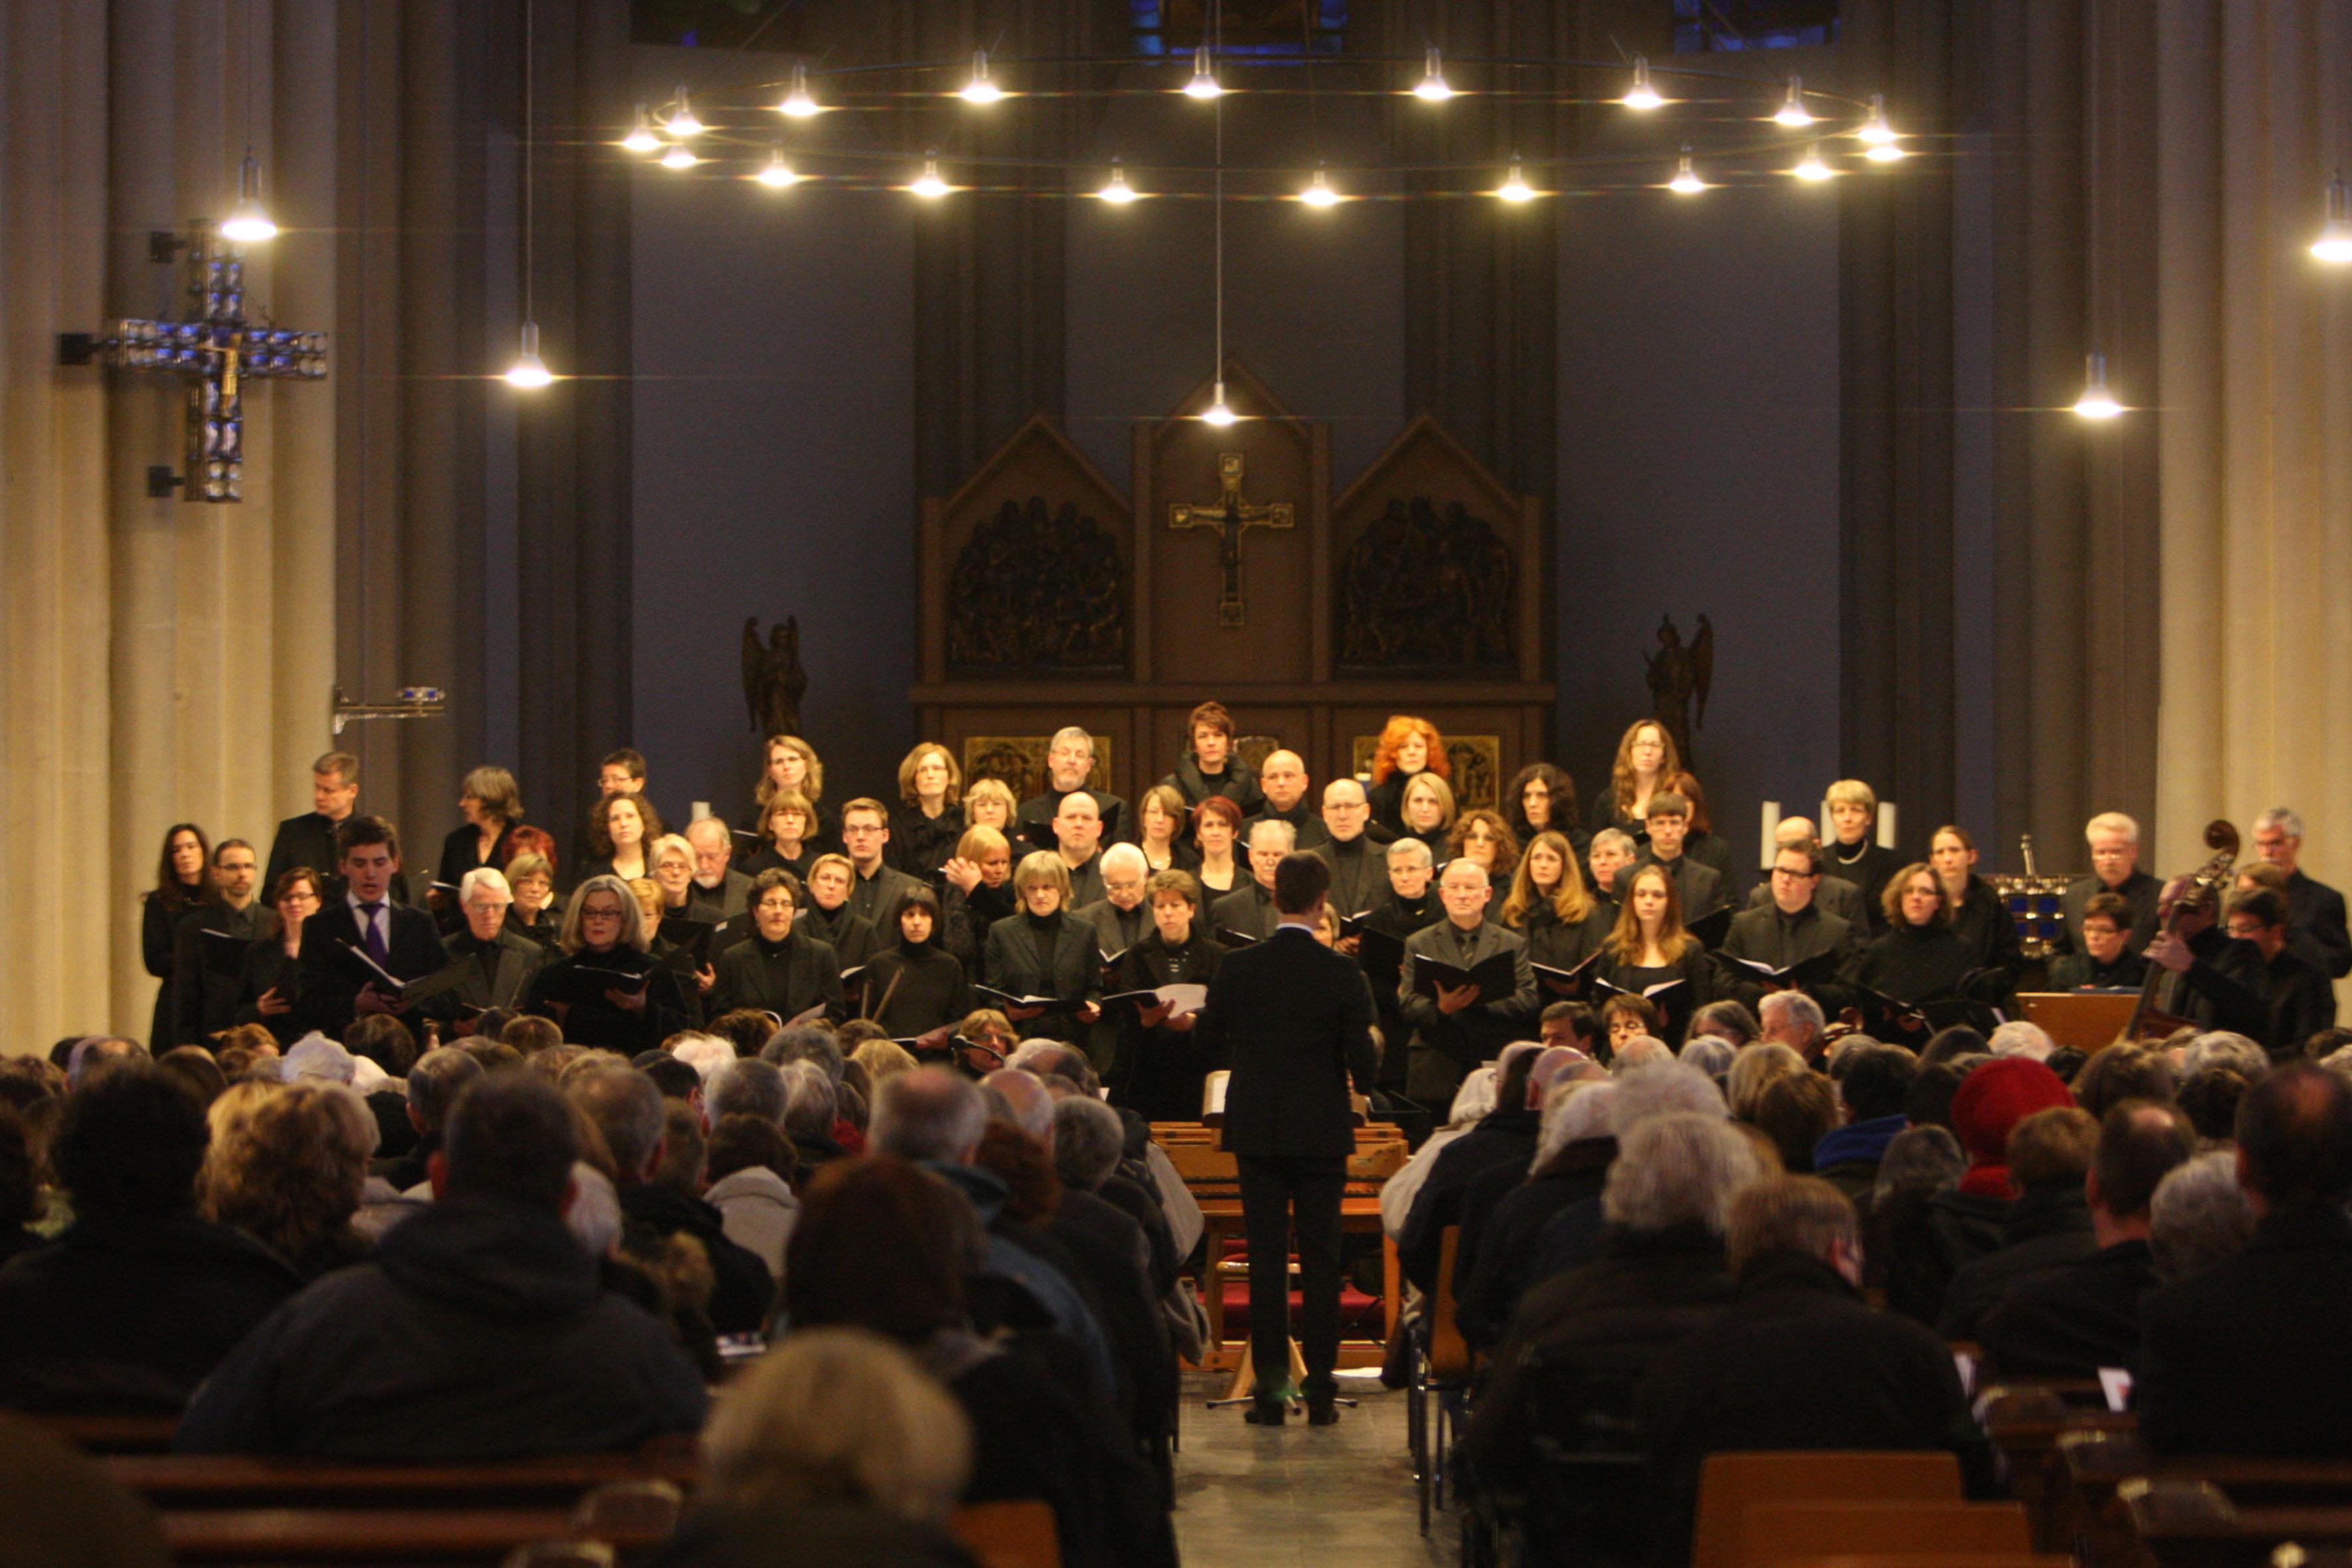 Johann Christoph Friedrich Bach: Der Tod Jesu im März 2013 - St. Josef, Krefeld